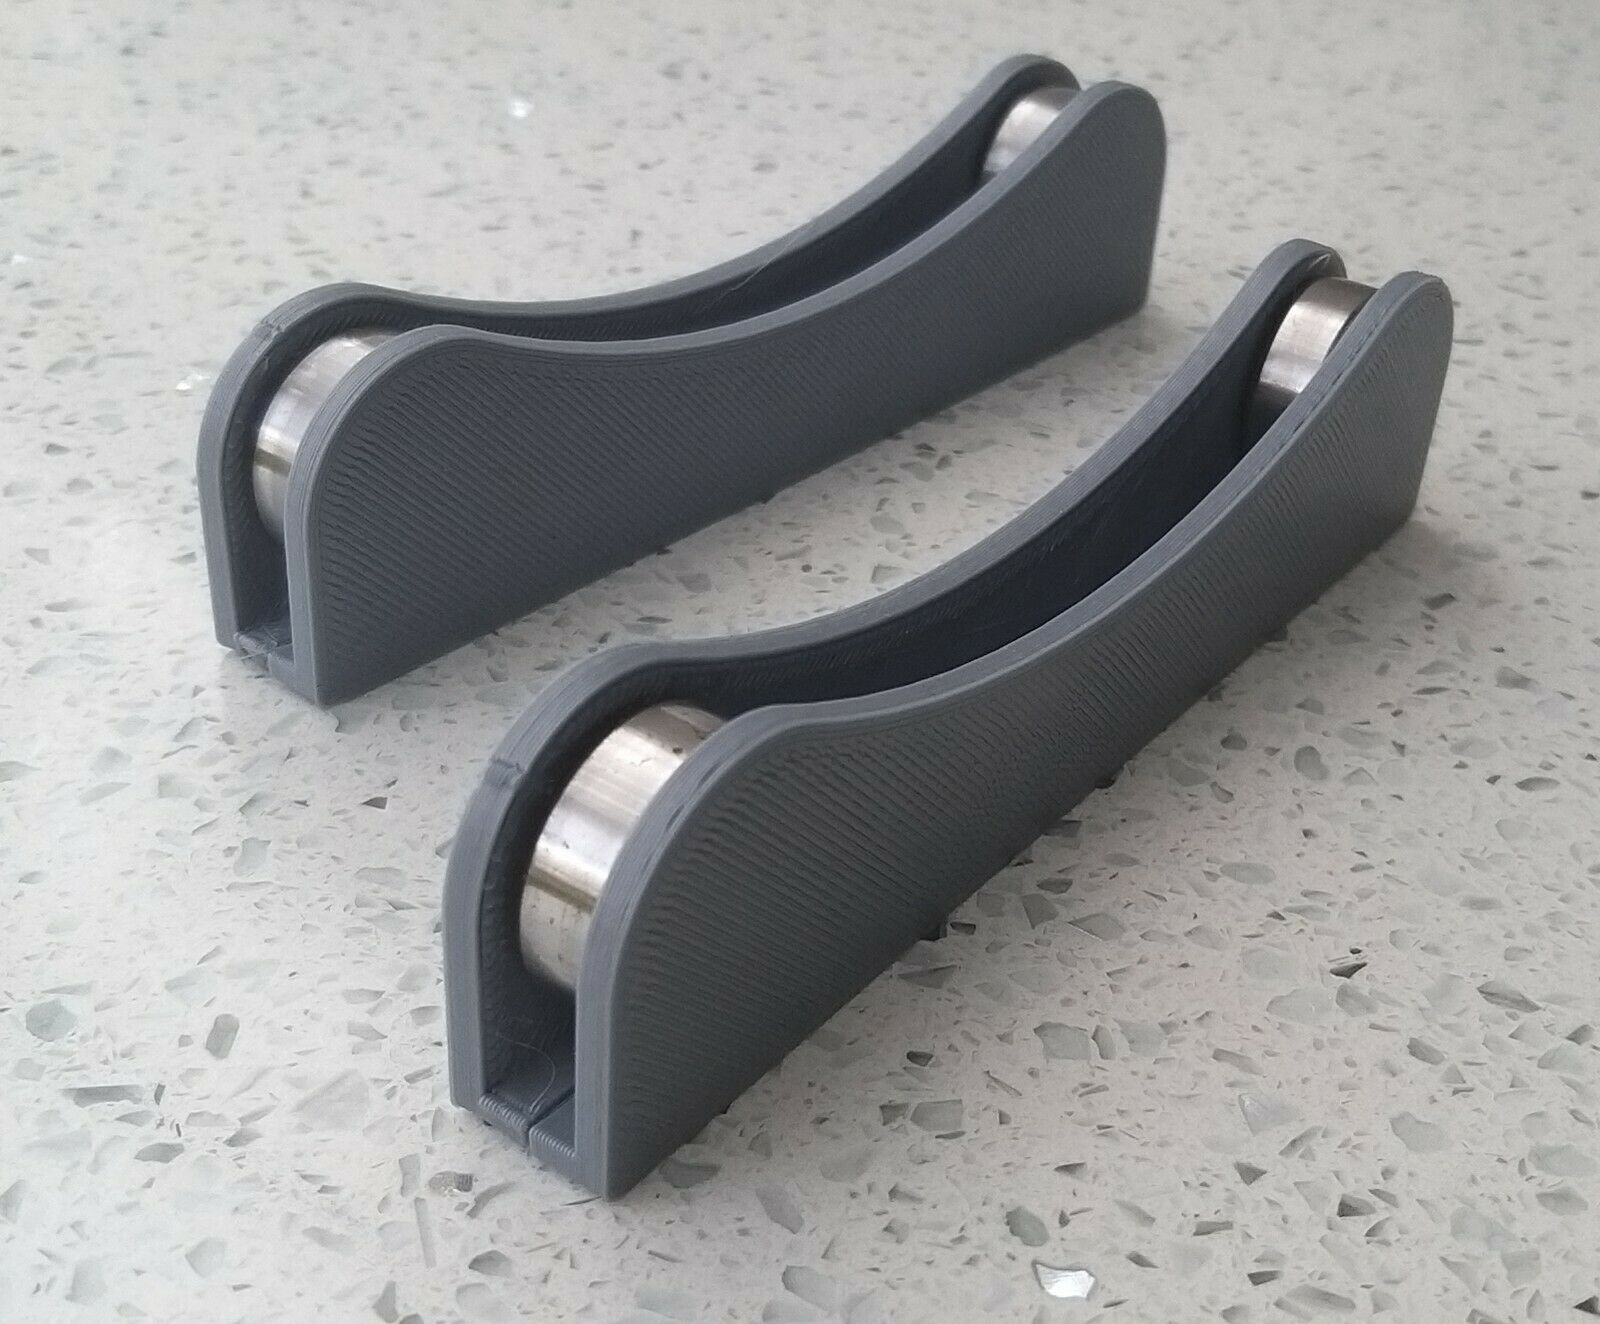 3D Printer Filament Spool Holder /Rollers un-winder 195mm Spool Diameter